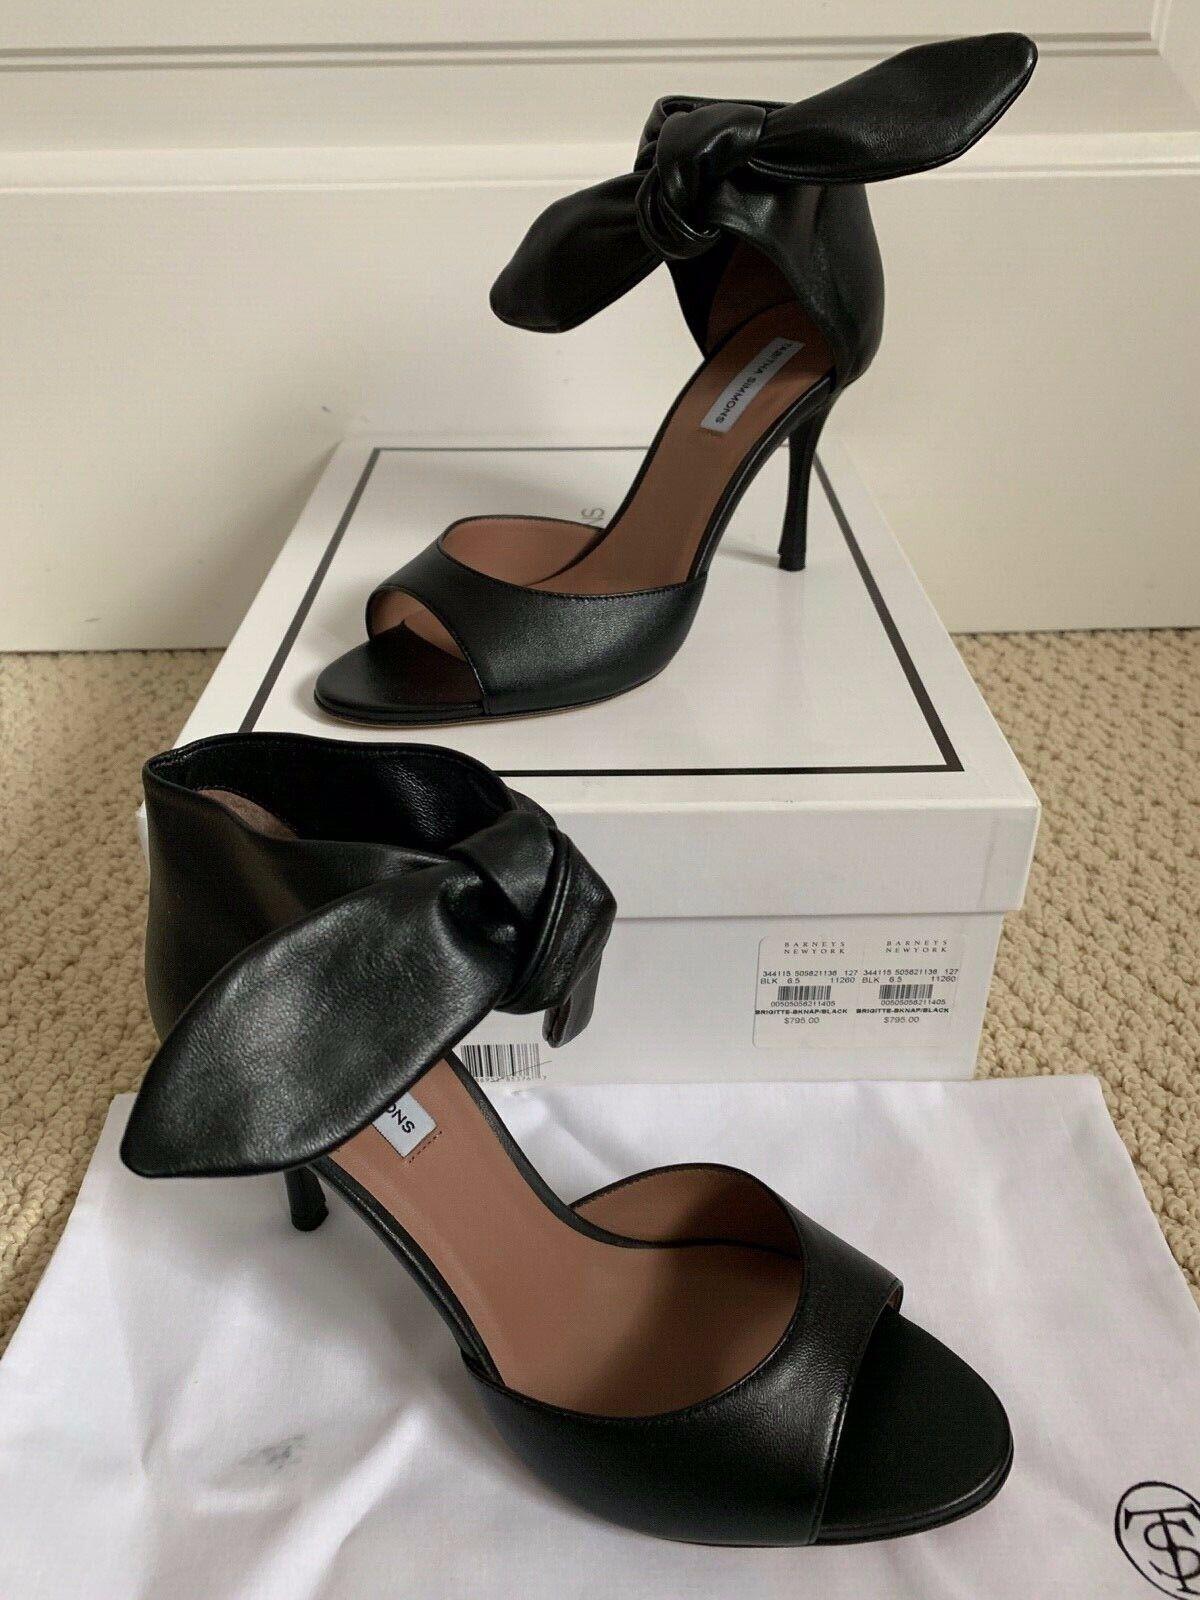 NIB Tabitha Simmons Brigitte Black Leather Ankle Tie Sandals Heels 36.5 6.5  795